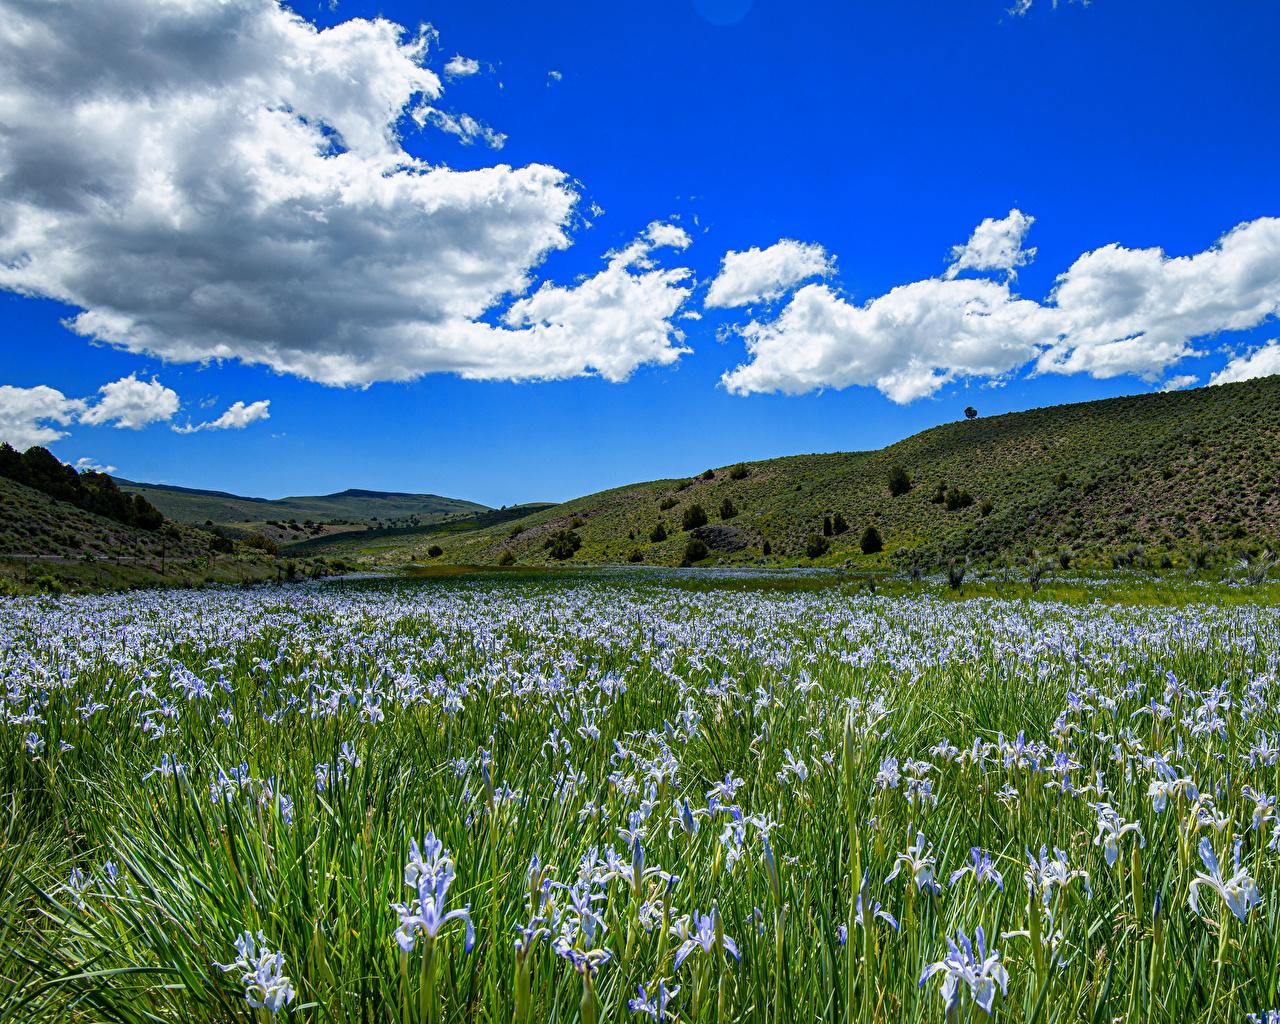 Images California USA Bridgeport Nature Sky Hill Irises Grasslands Clouds iris Meadow